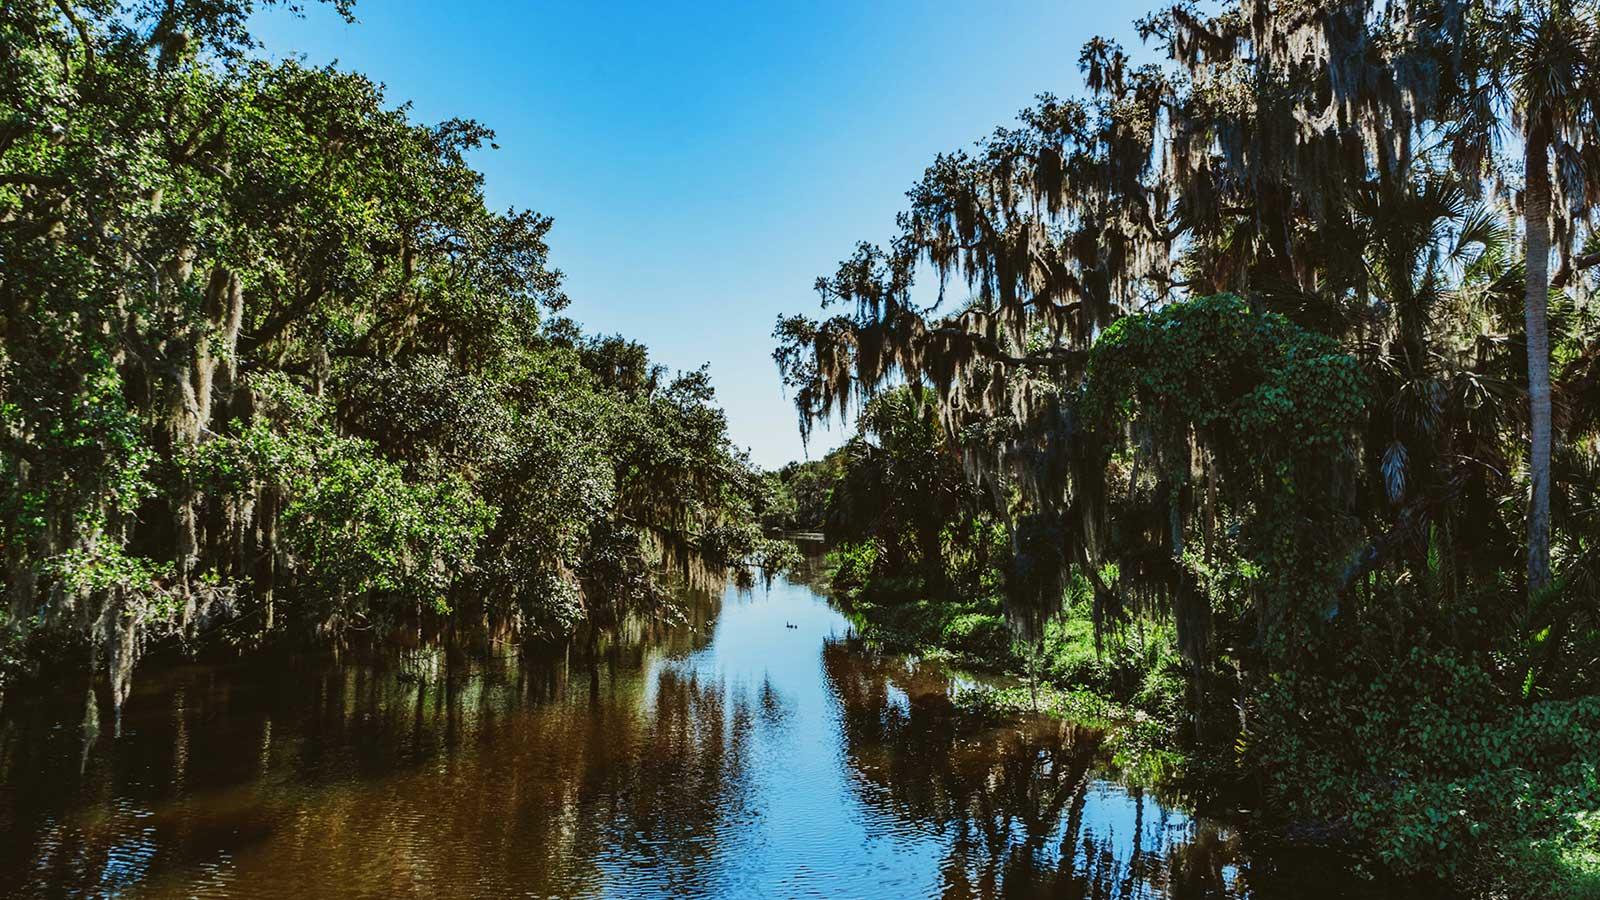 Florida-Spoil-Island--Ttampa-Bay-Estuary-Program-mc---Spoil-Island-Project---Florida